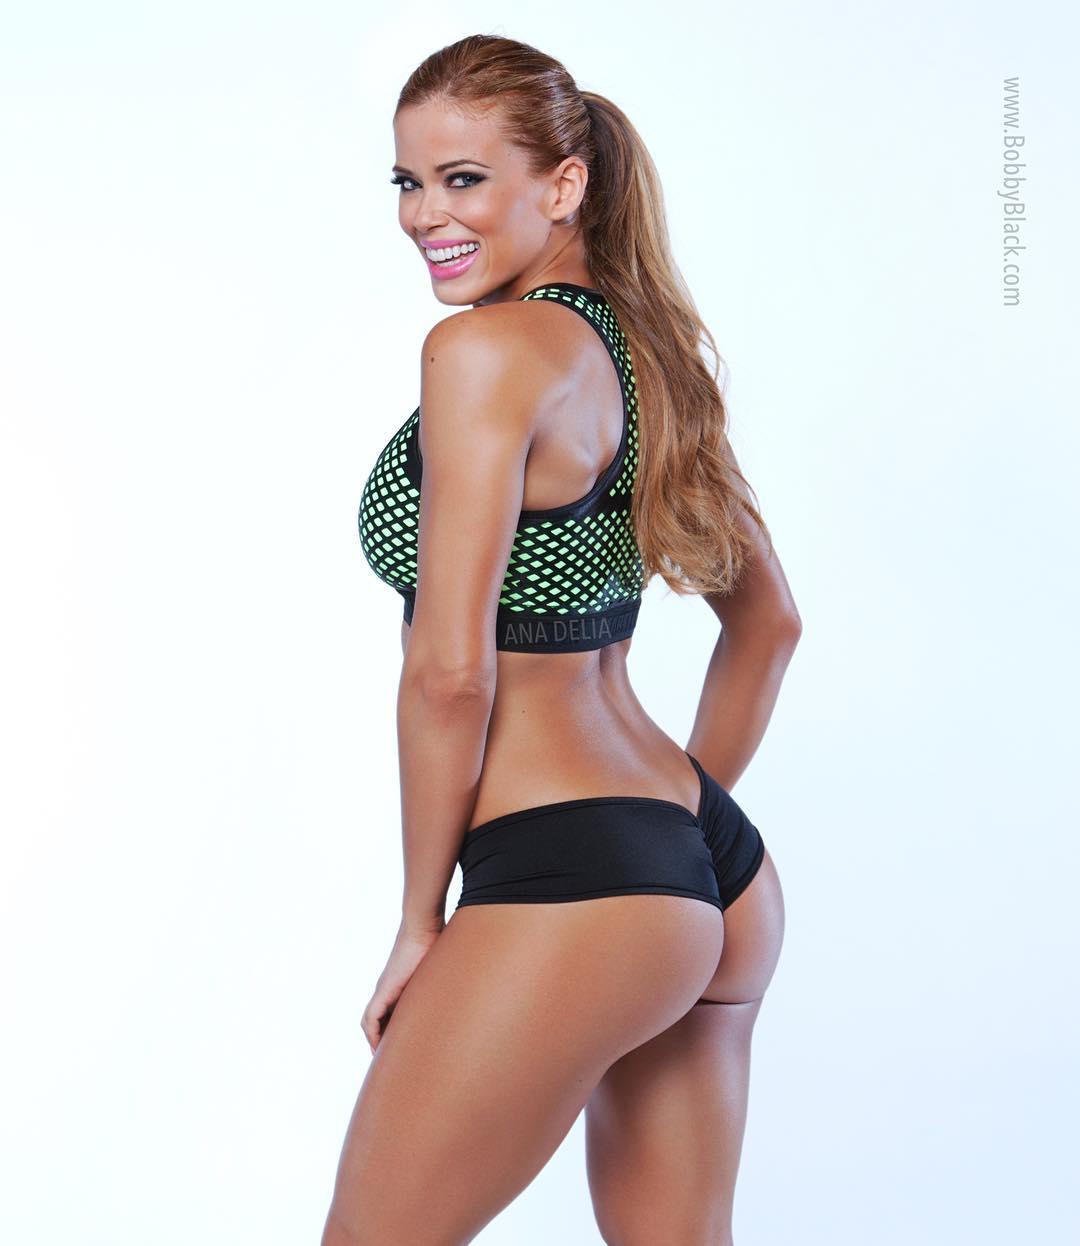 Ifbb pro bikini athlete ana delia de iturrondo talks with simplyshredded.com